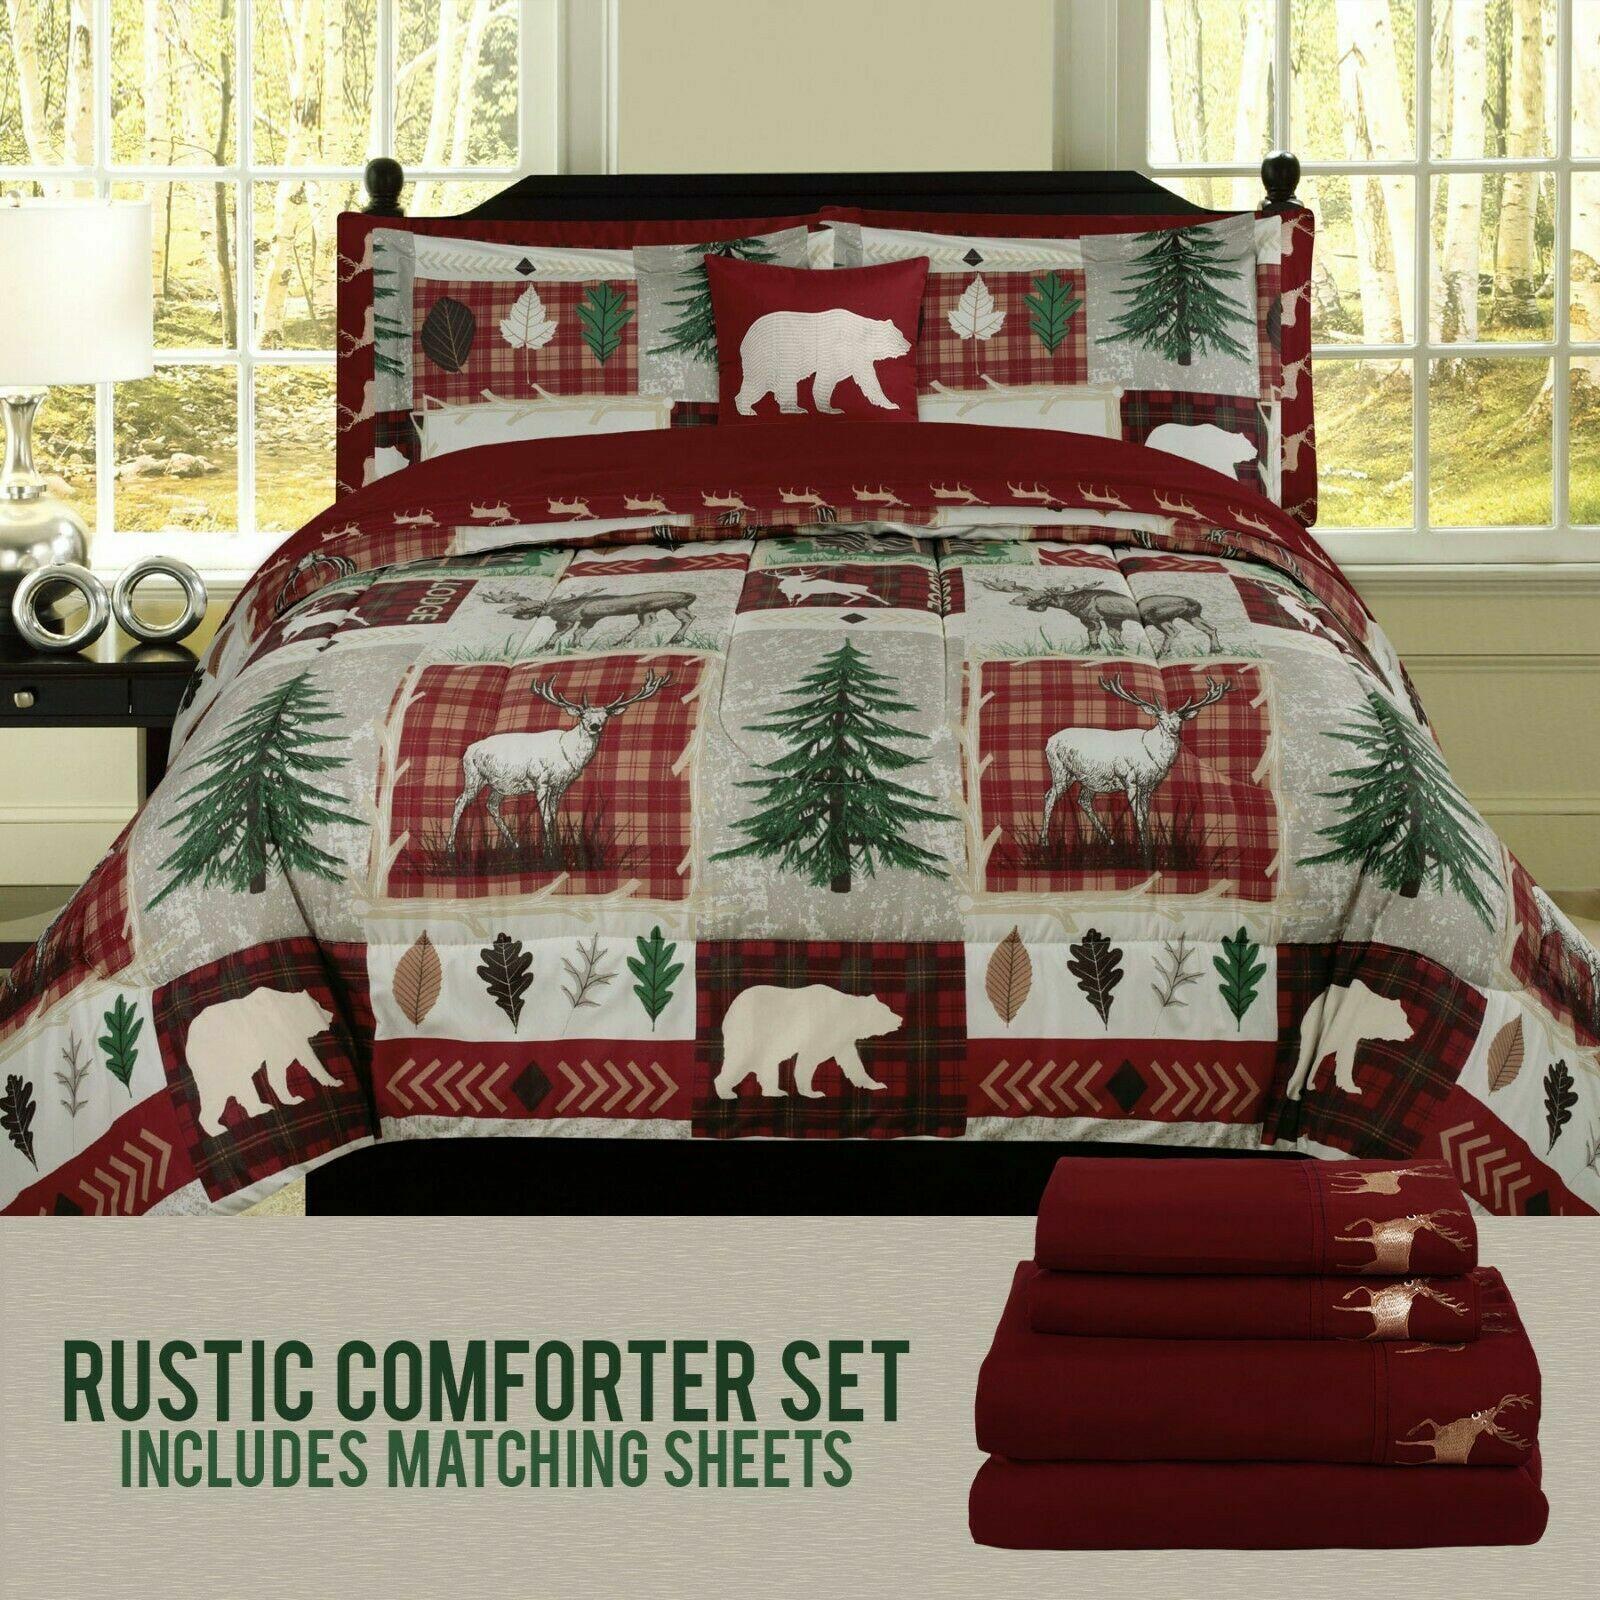 Bear Lodge Comforter Bedding and Deer Sheet Set Cabin Hunting Lodge Bed in Bag Bed-in-a-Bag